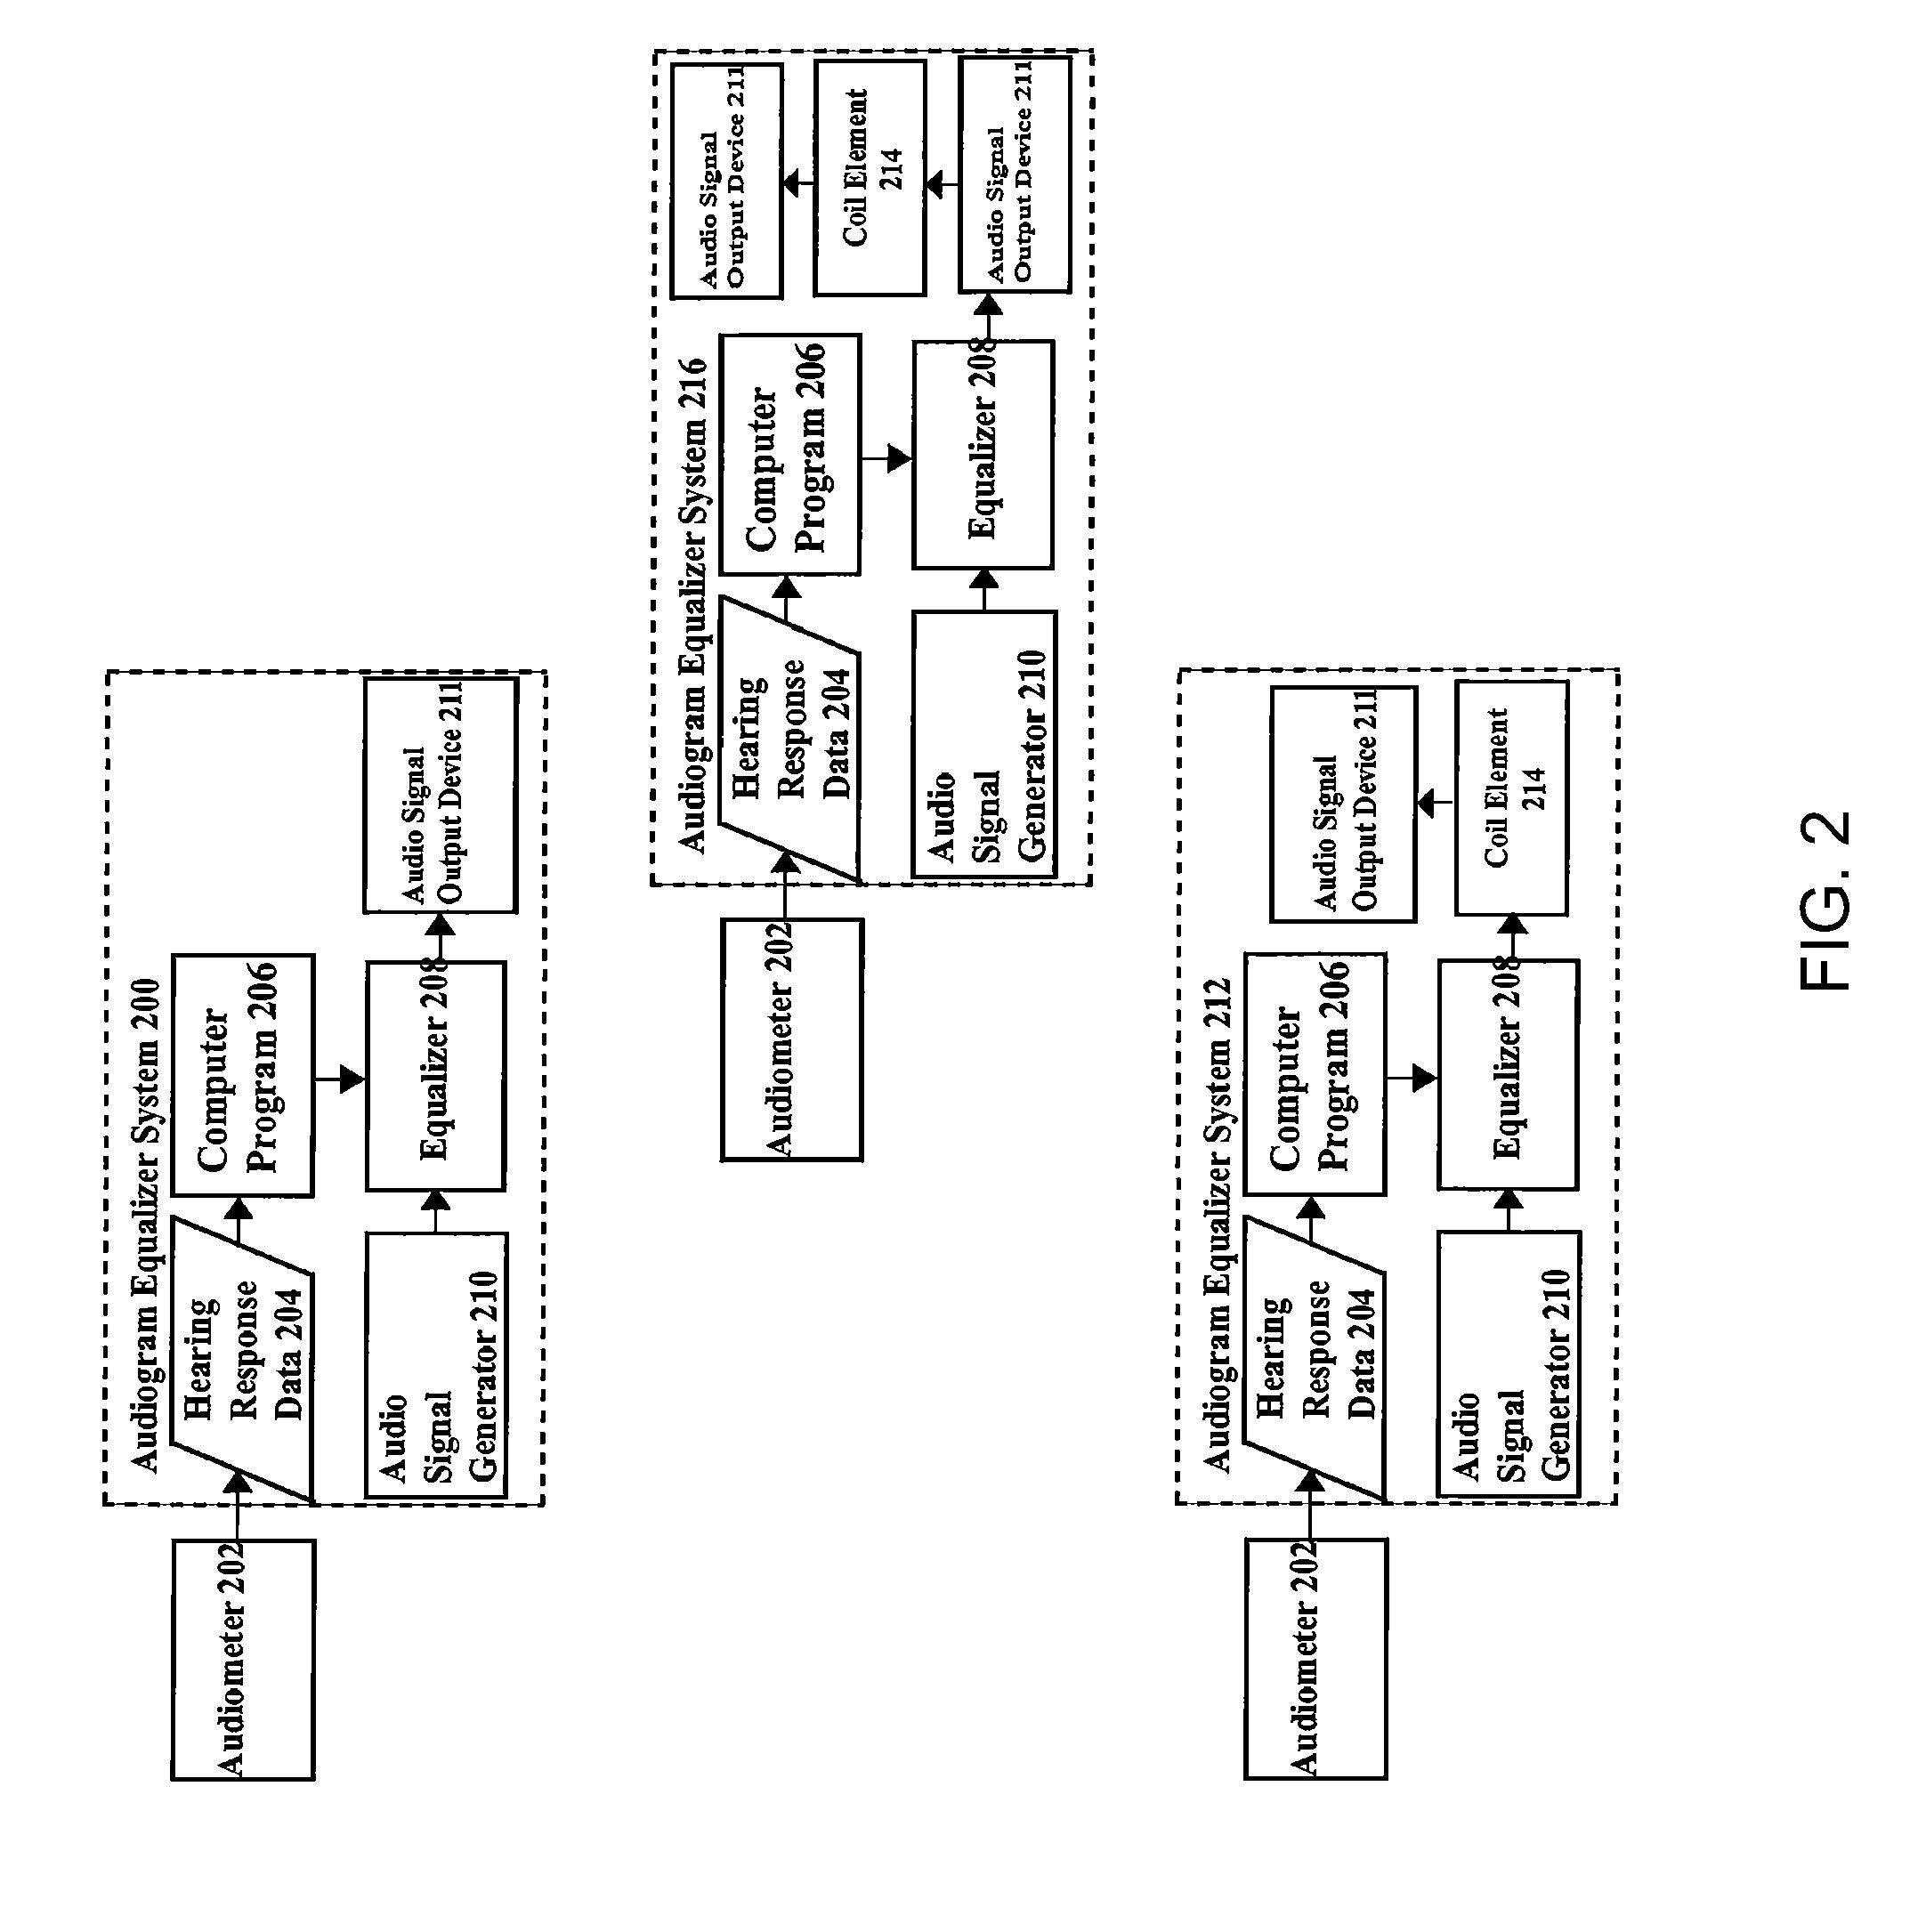 Audiovox Bcs1 Wiring Diagram